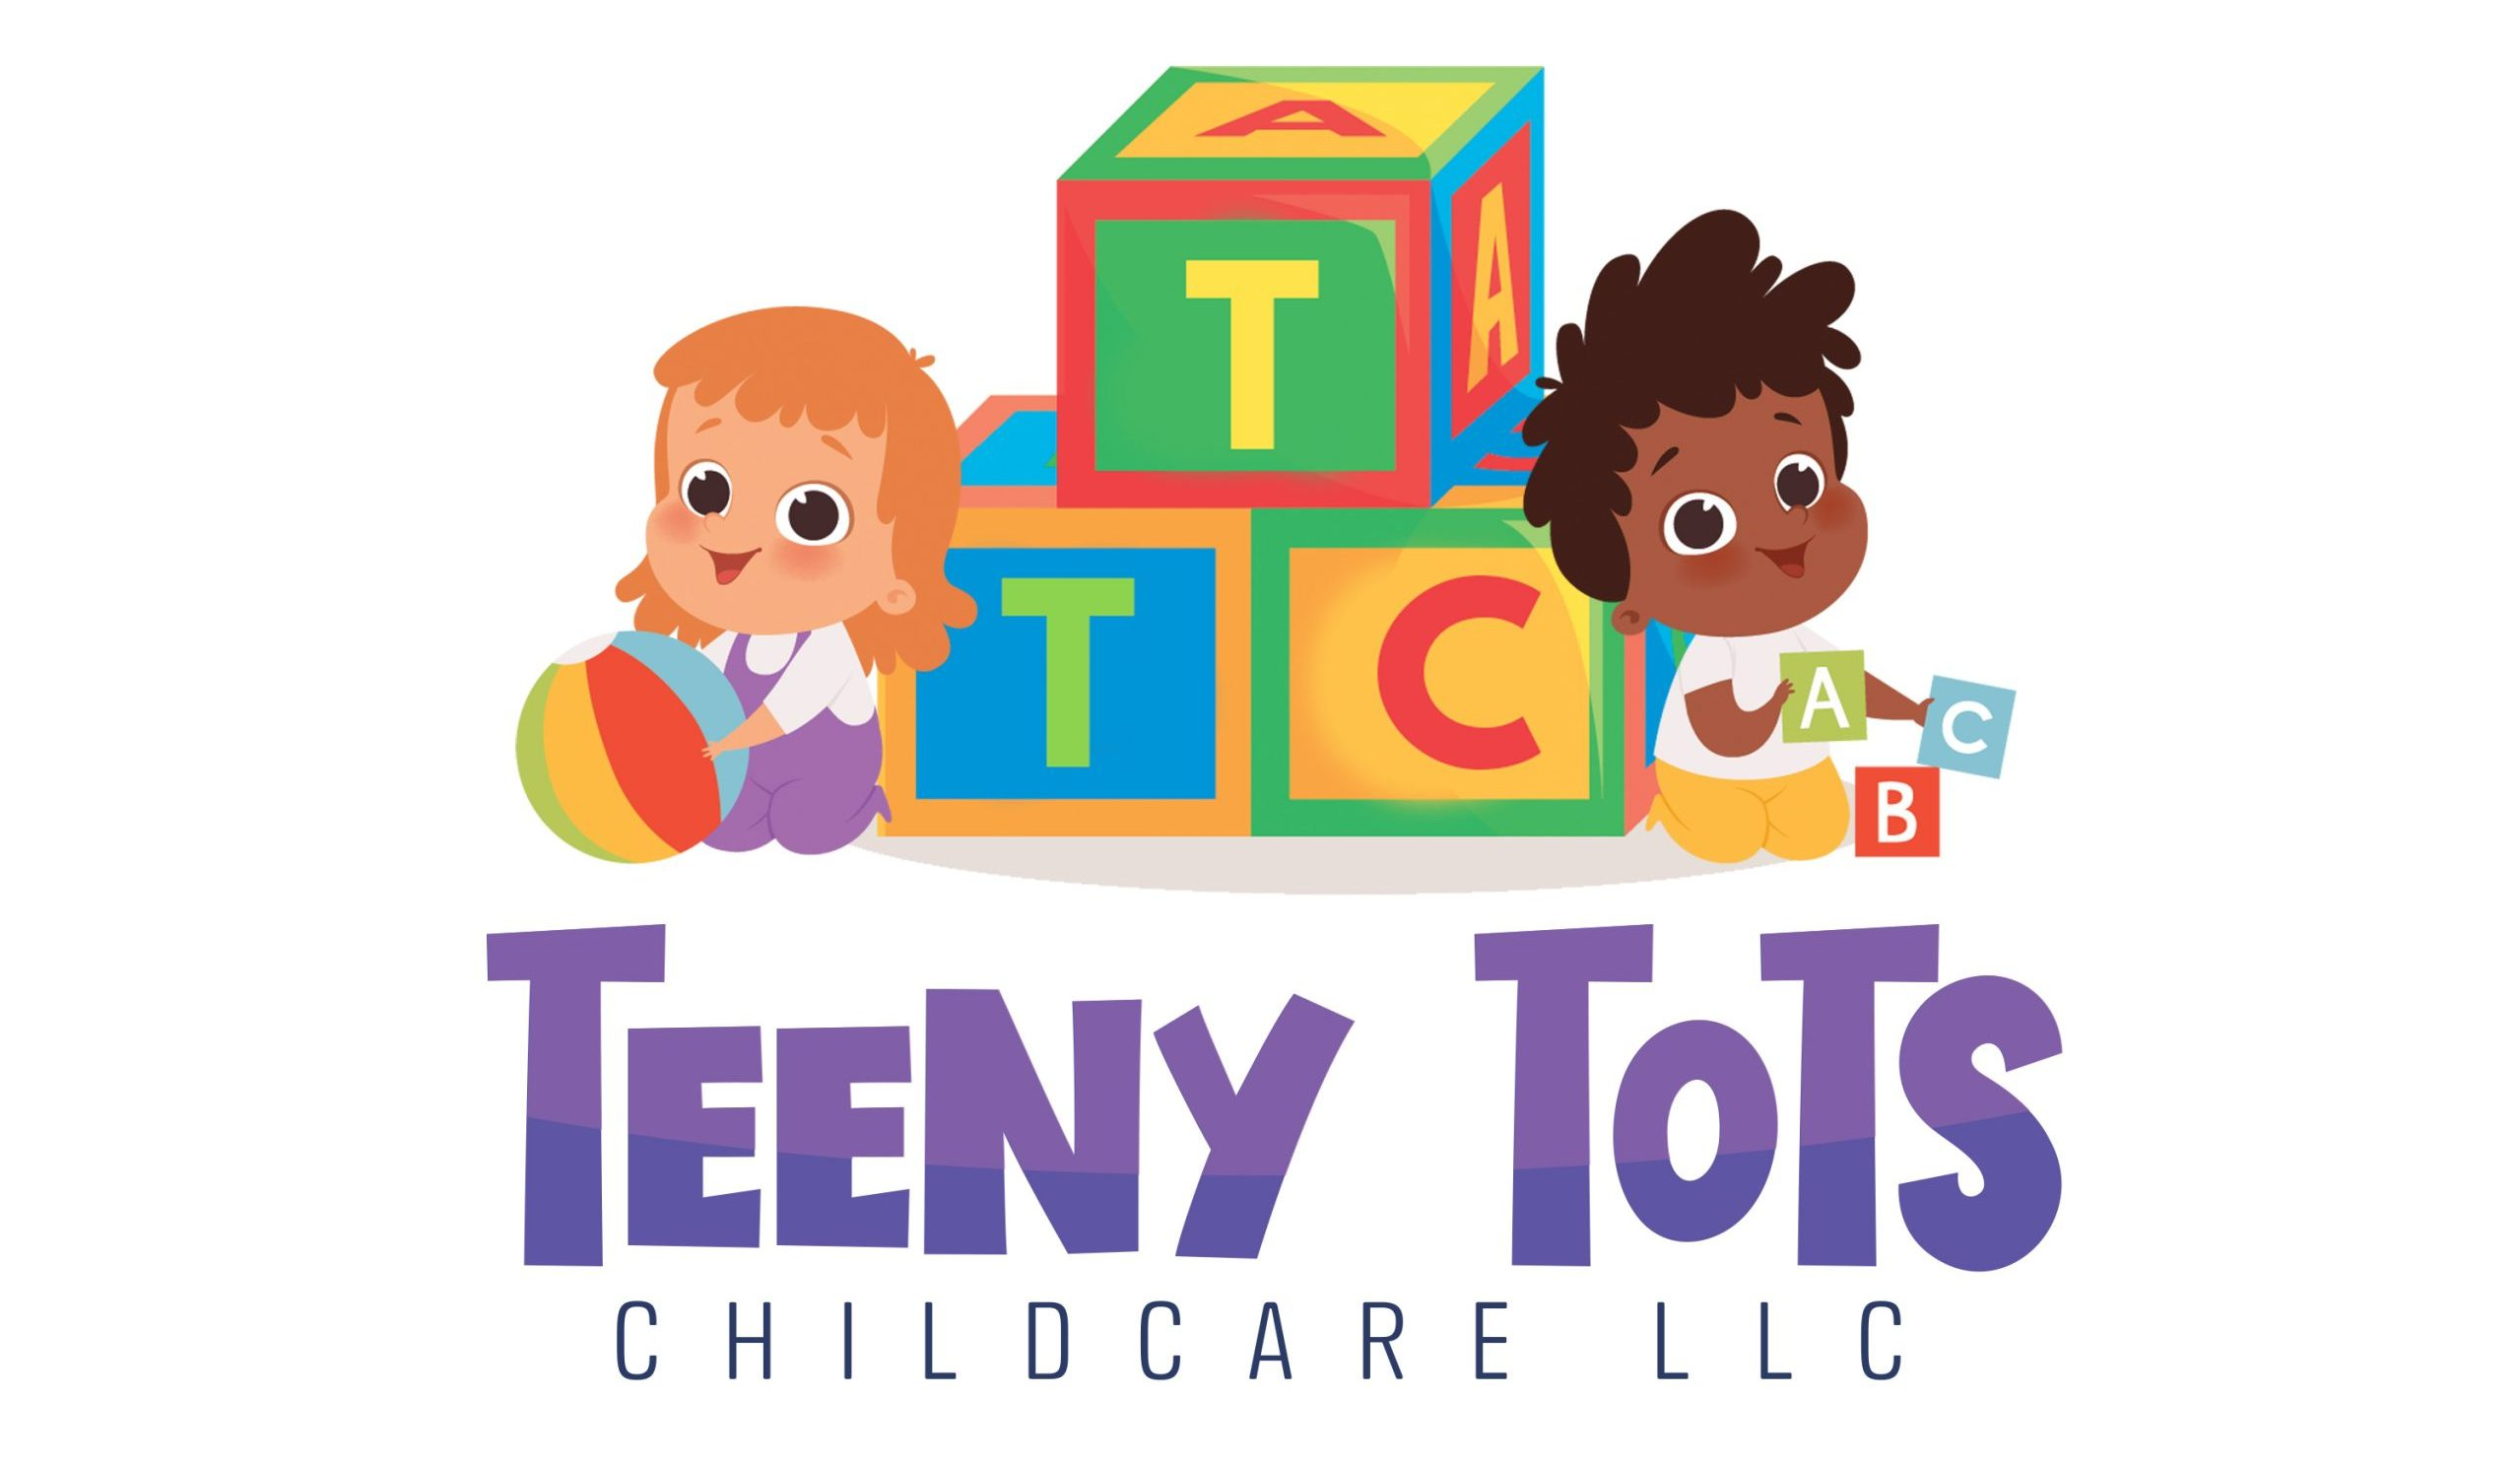 Teeny Tots Childcare LLC